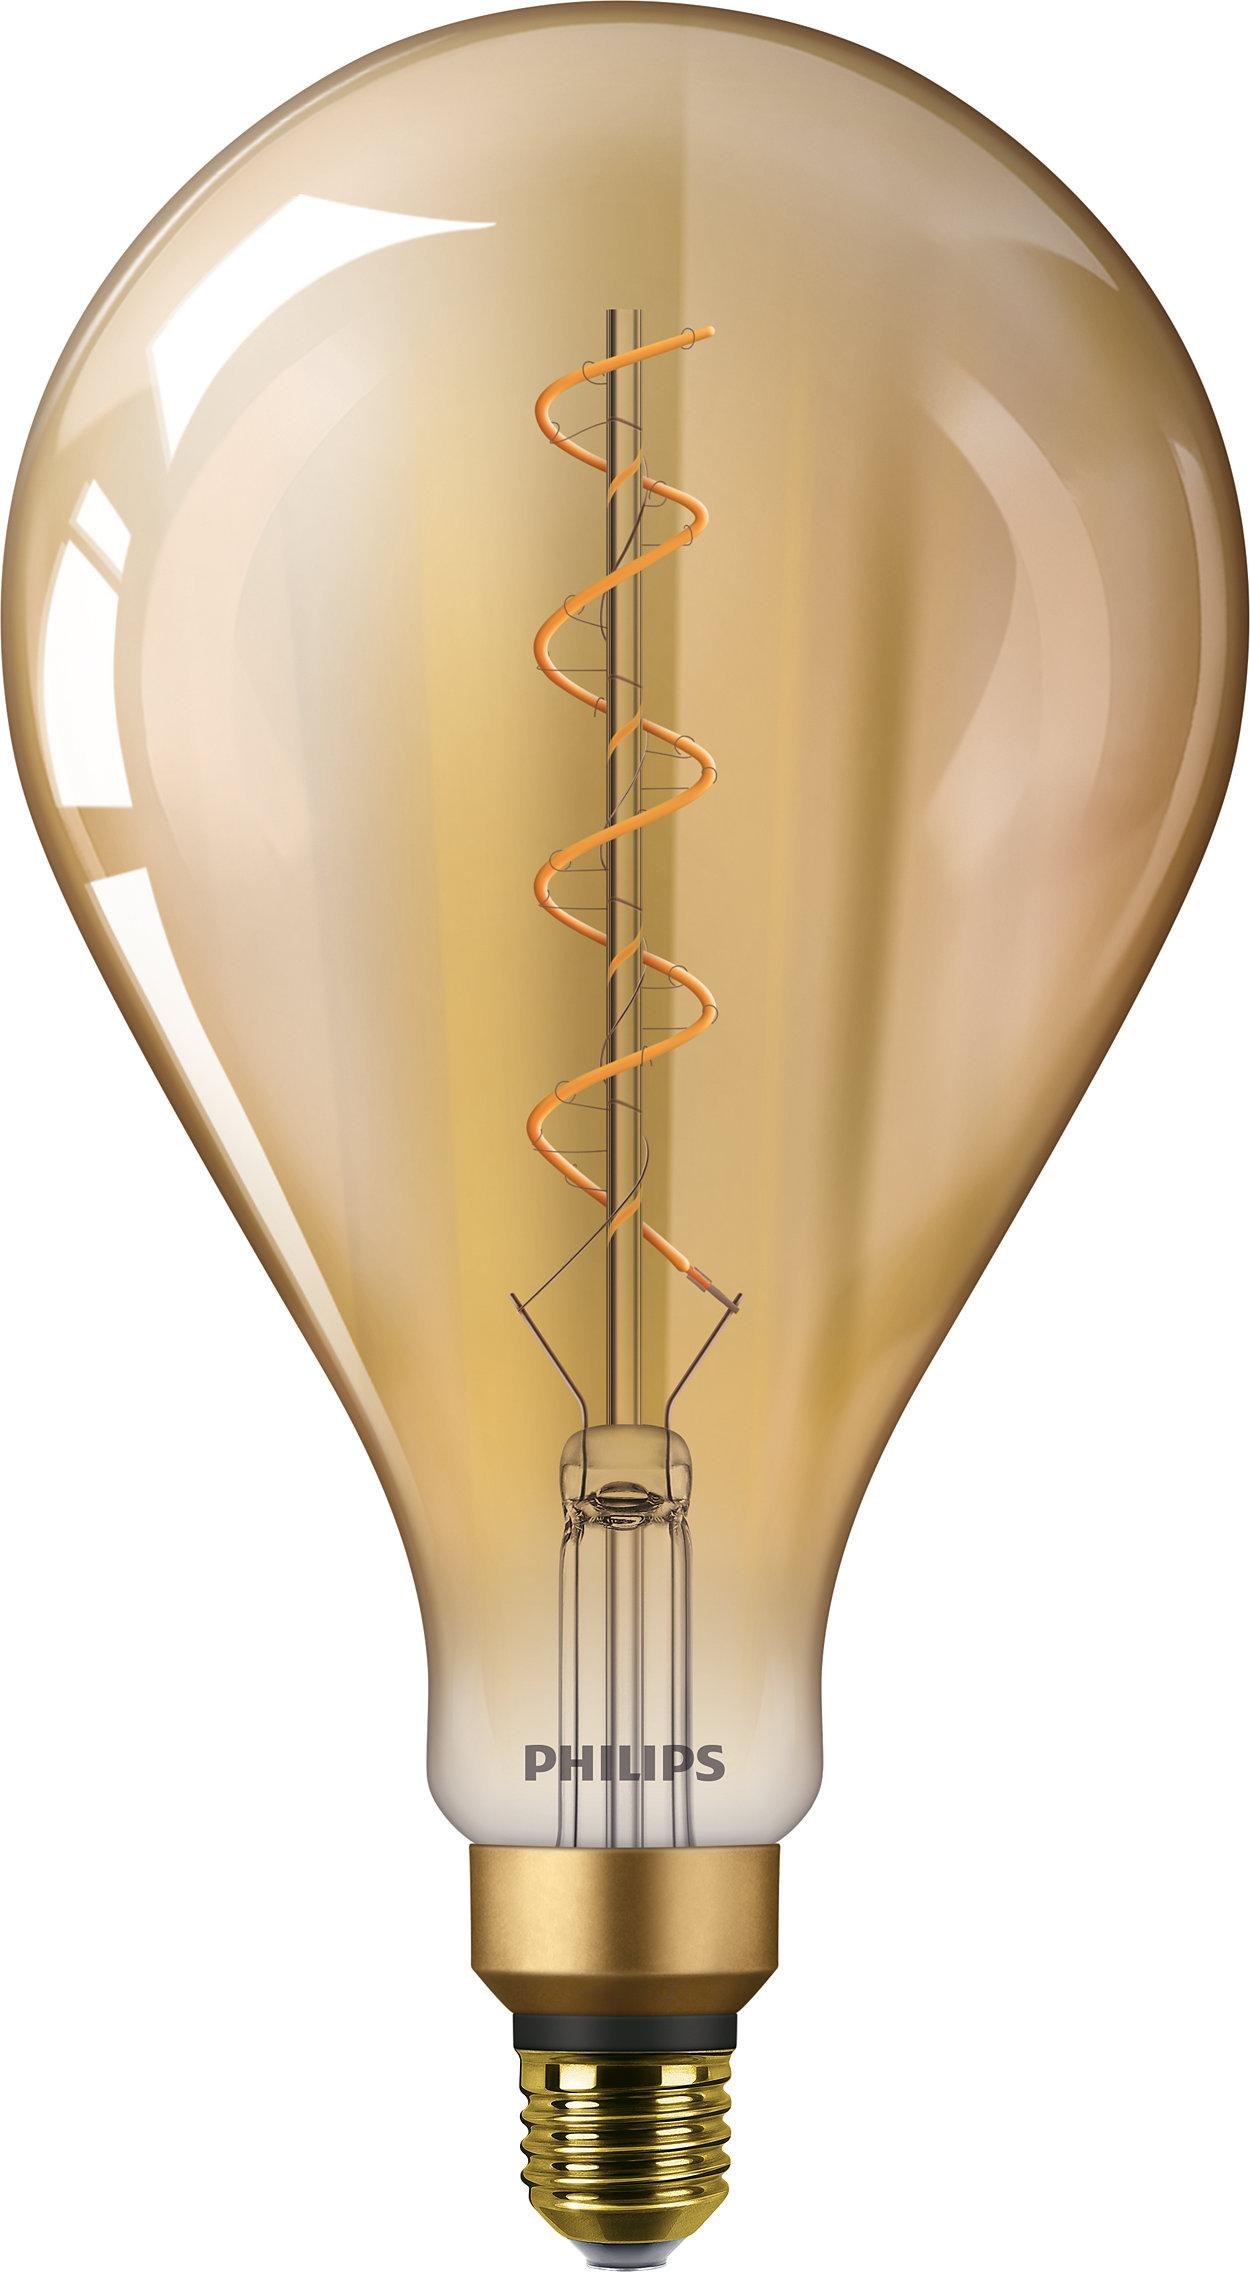 Die Classic LEDbulb Deko-Kollektion